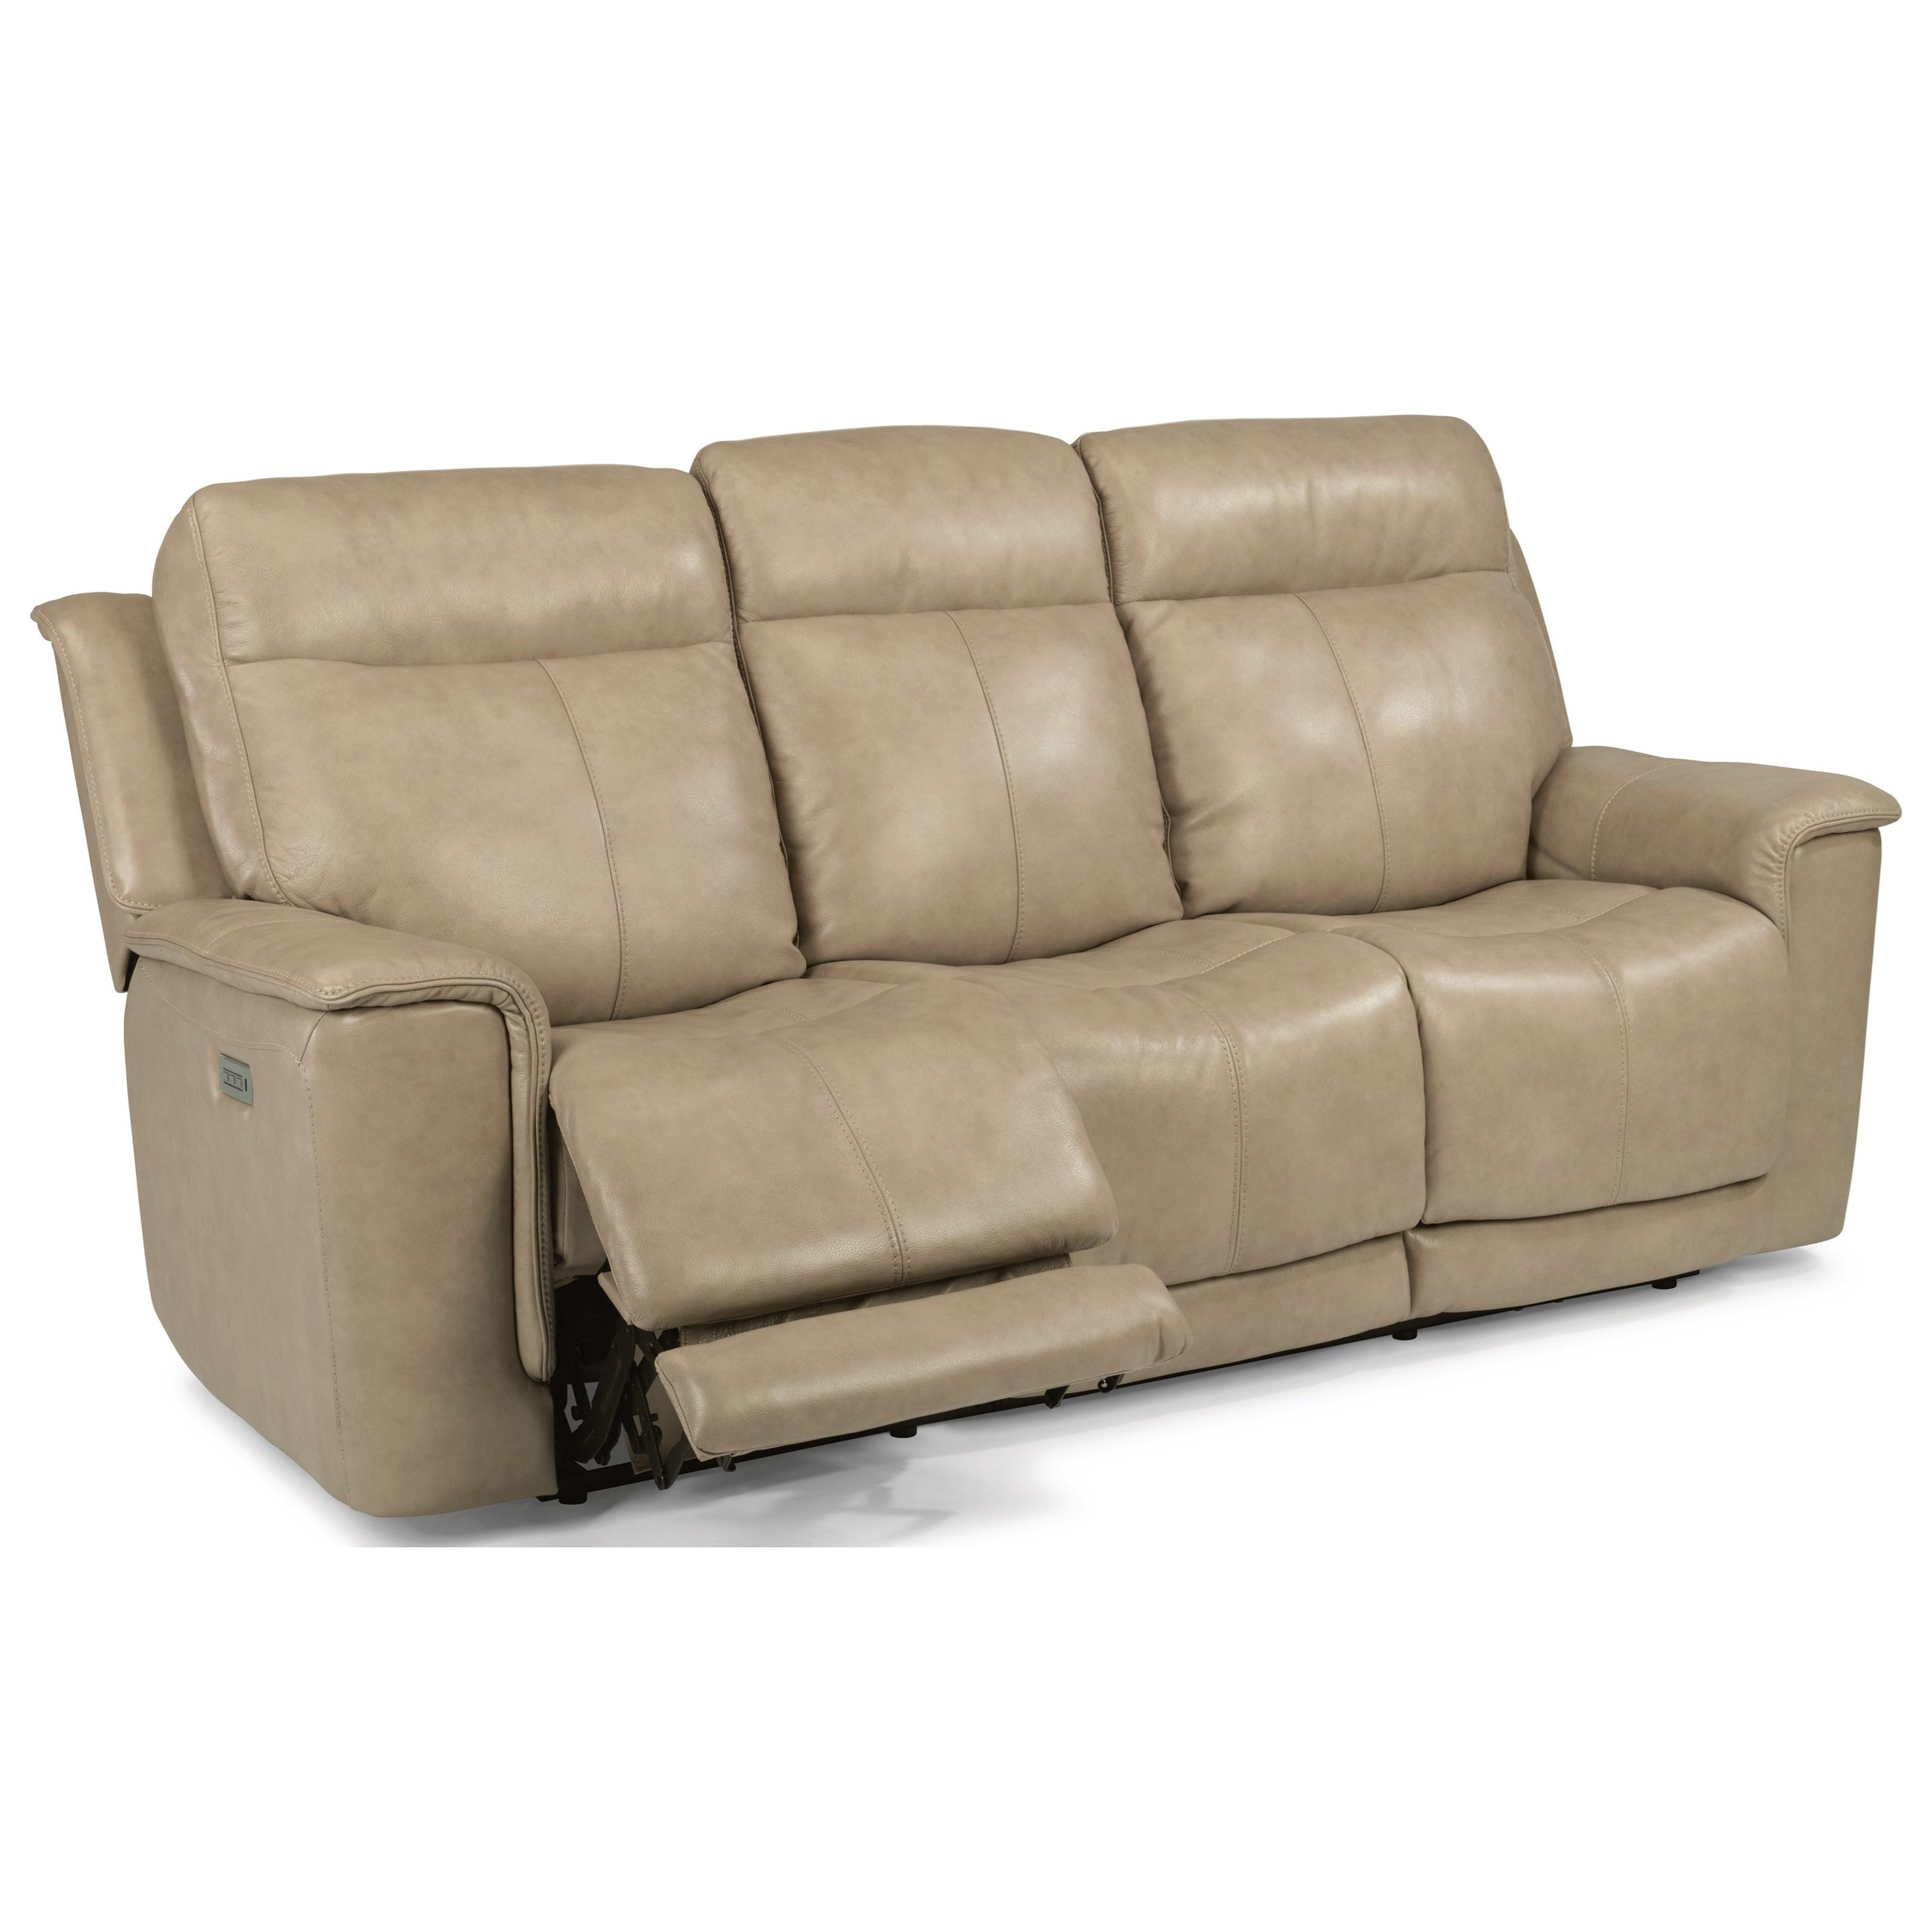 Flexsteel Sofa Leather Flexsteel Port Royal Brown Leather